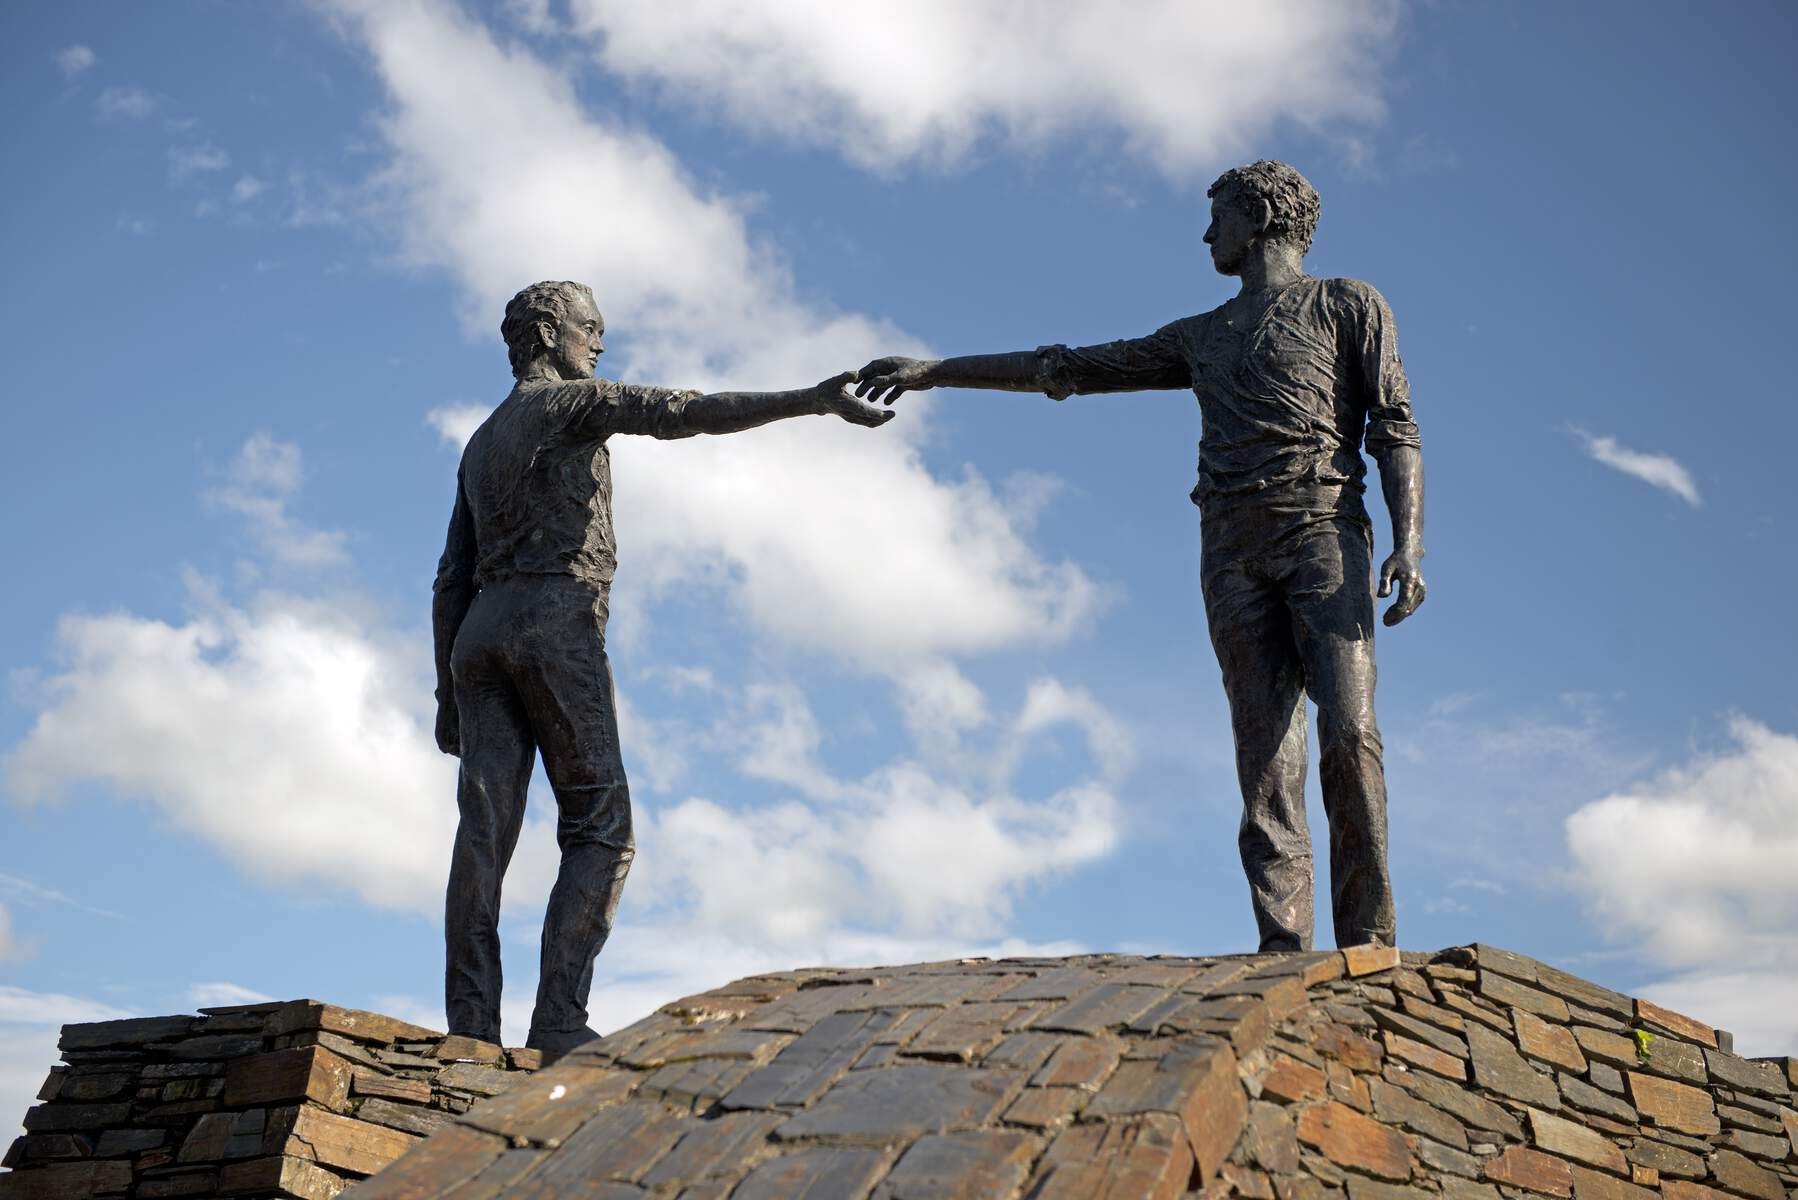 Hands Across the Divide Sculpture